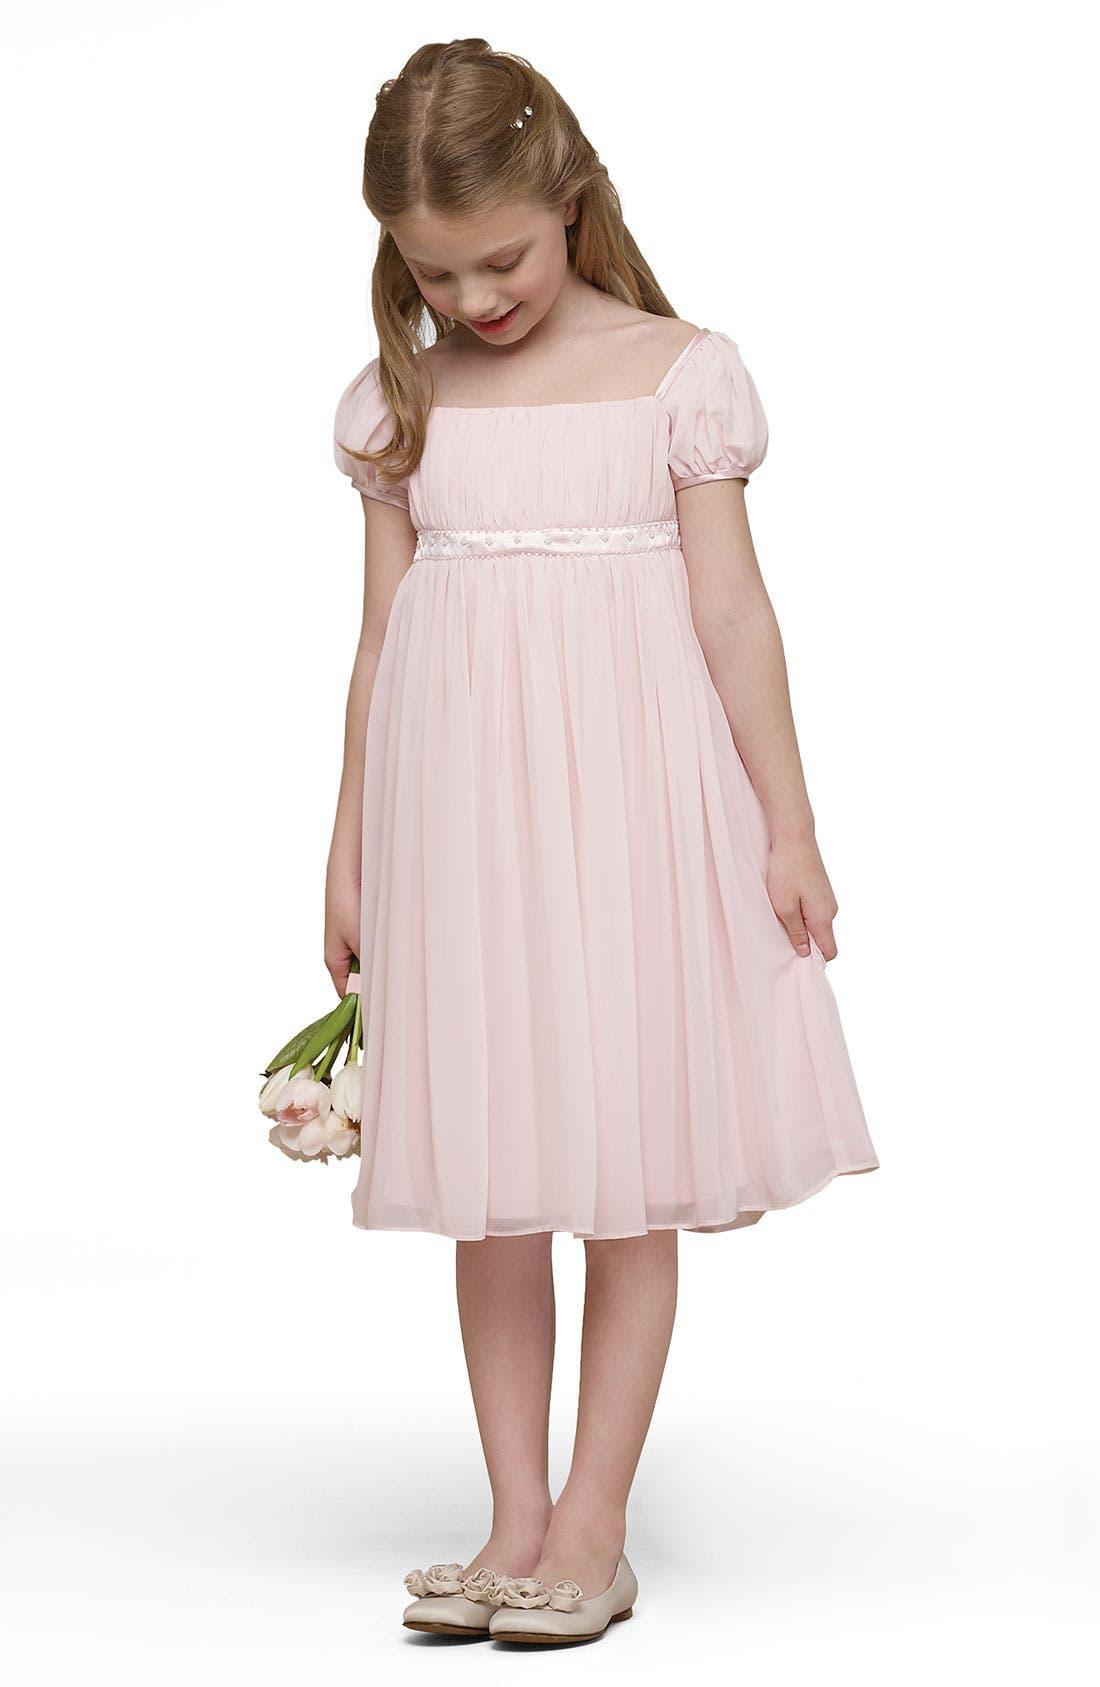 Alternate Image 1 Selected - Us Angels 'Renaissance' Chiffon Dress (Little Girls & Big Girls)